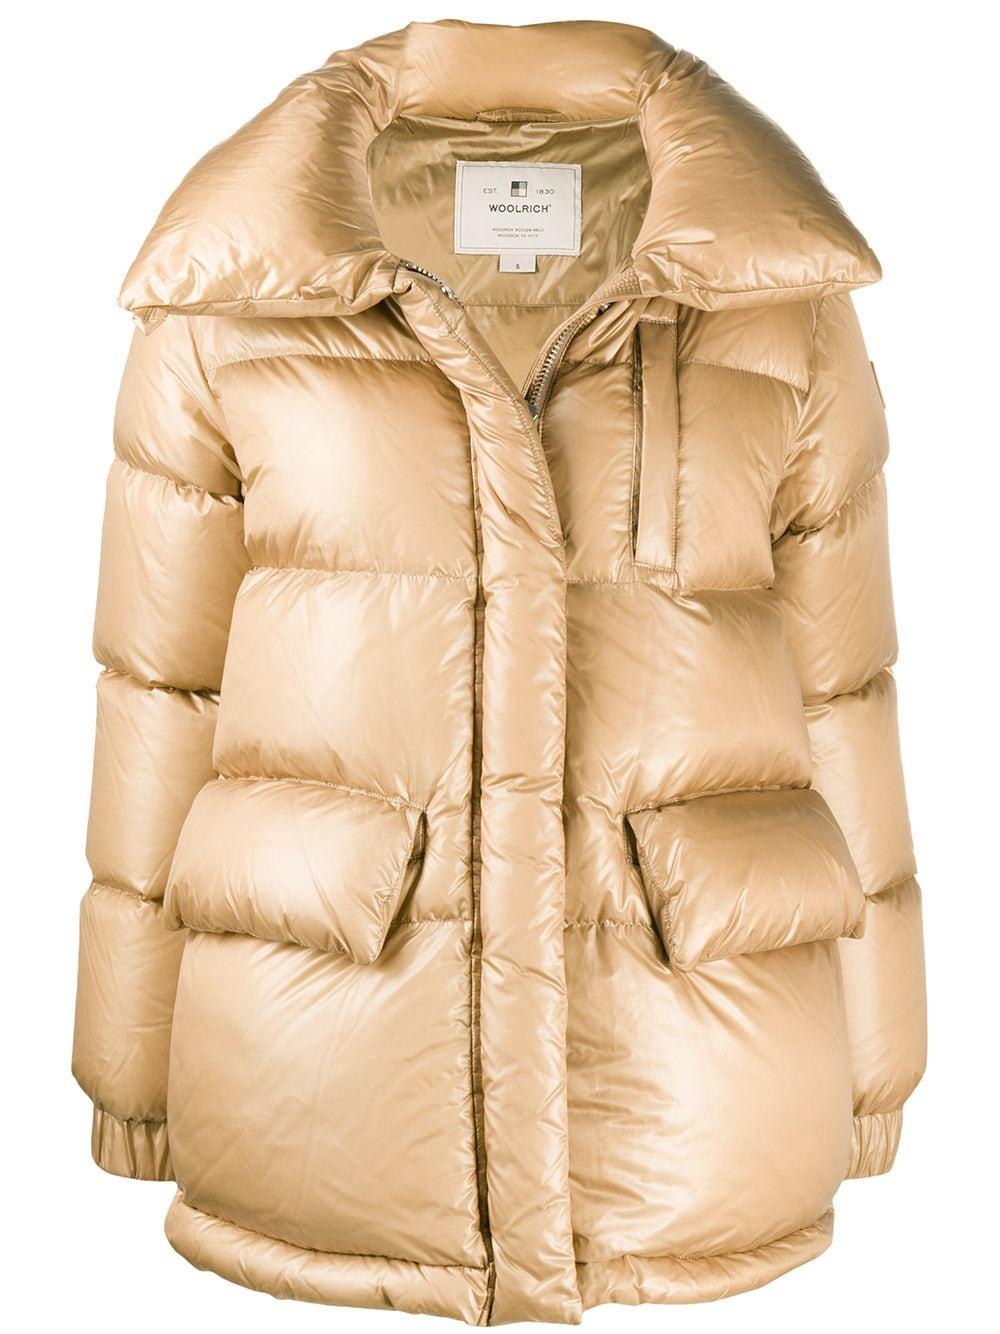 Aliquippa Down Coat